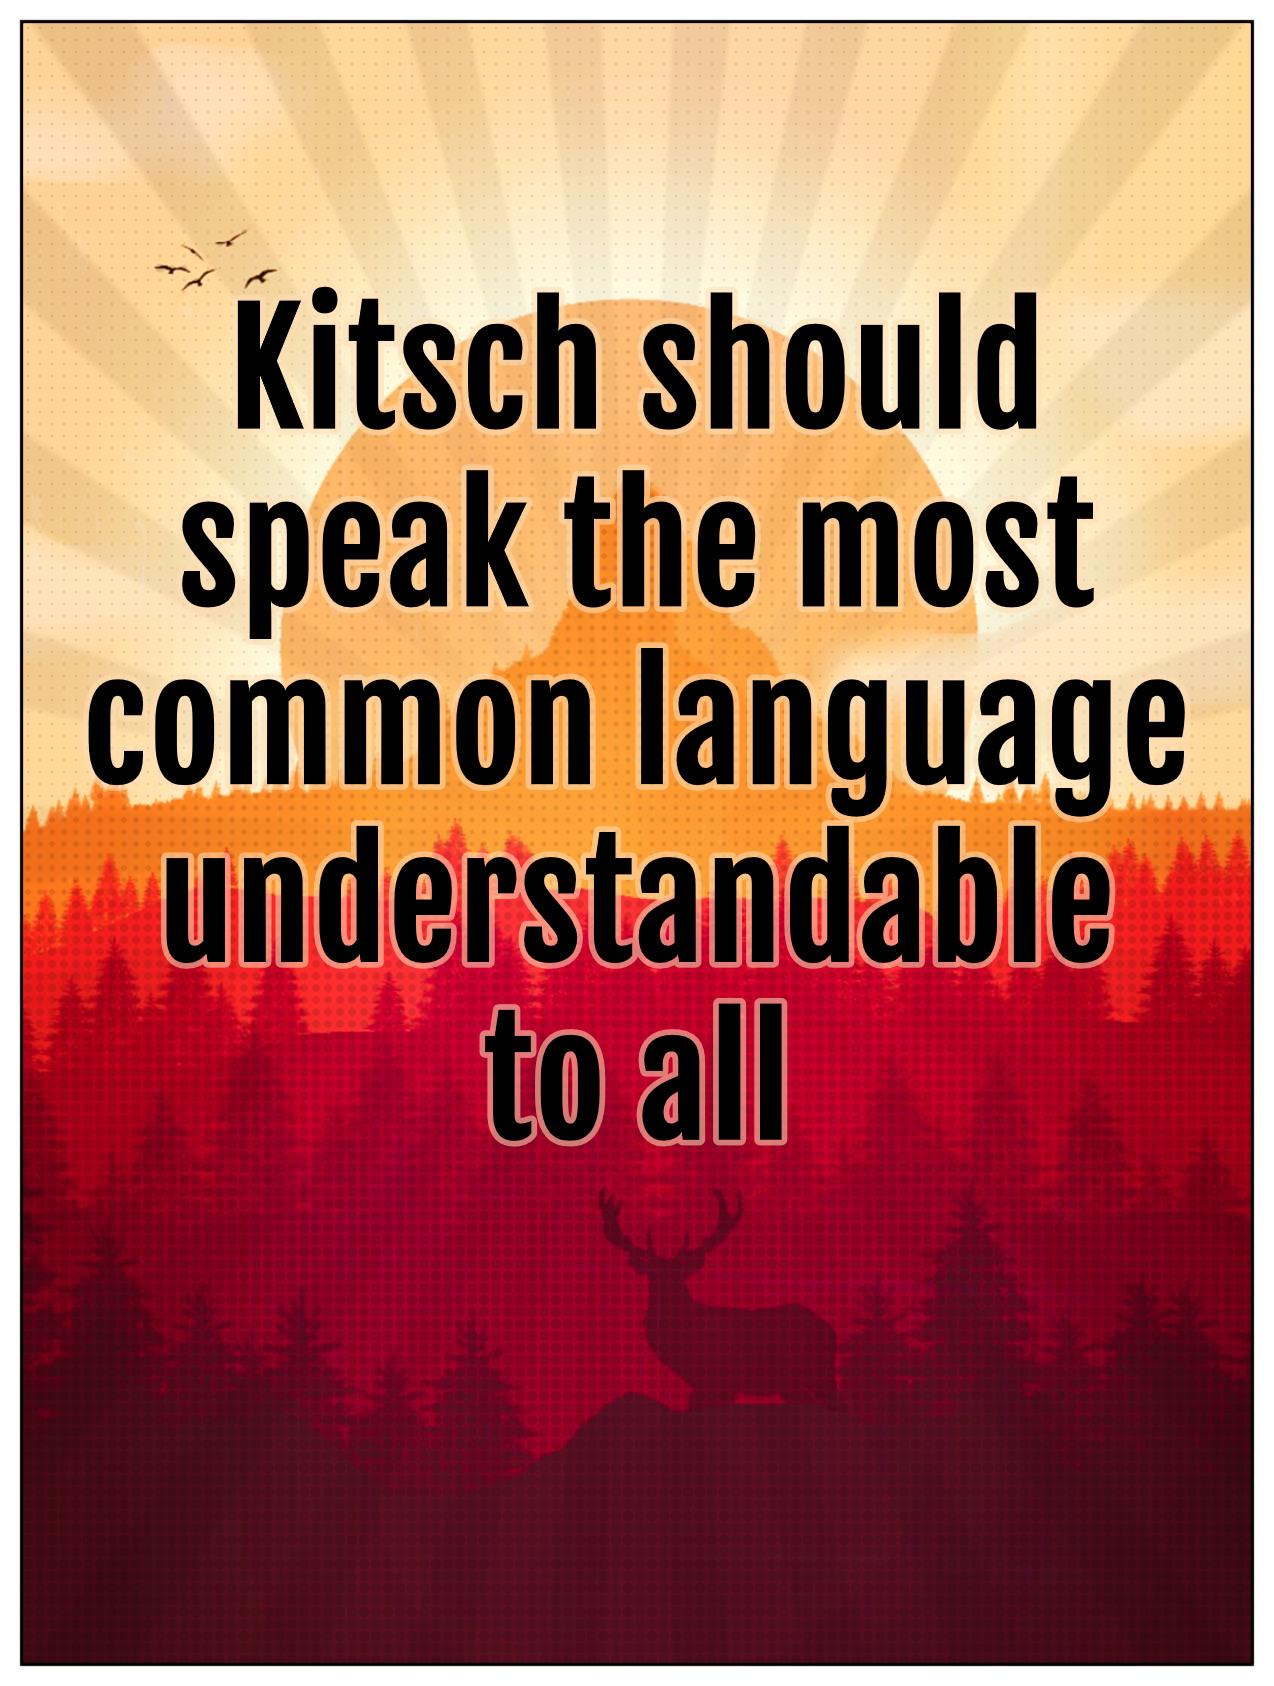 bekitschig blog Kitsch should sspeak the most common language understandable to all Tomas Kulka